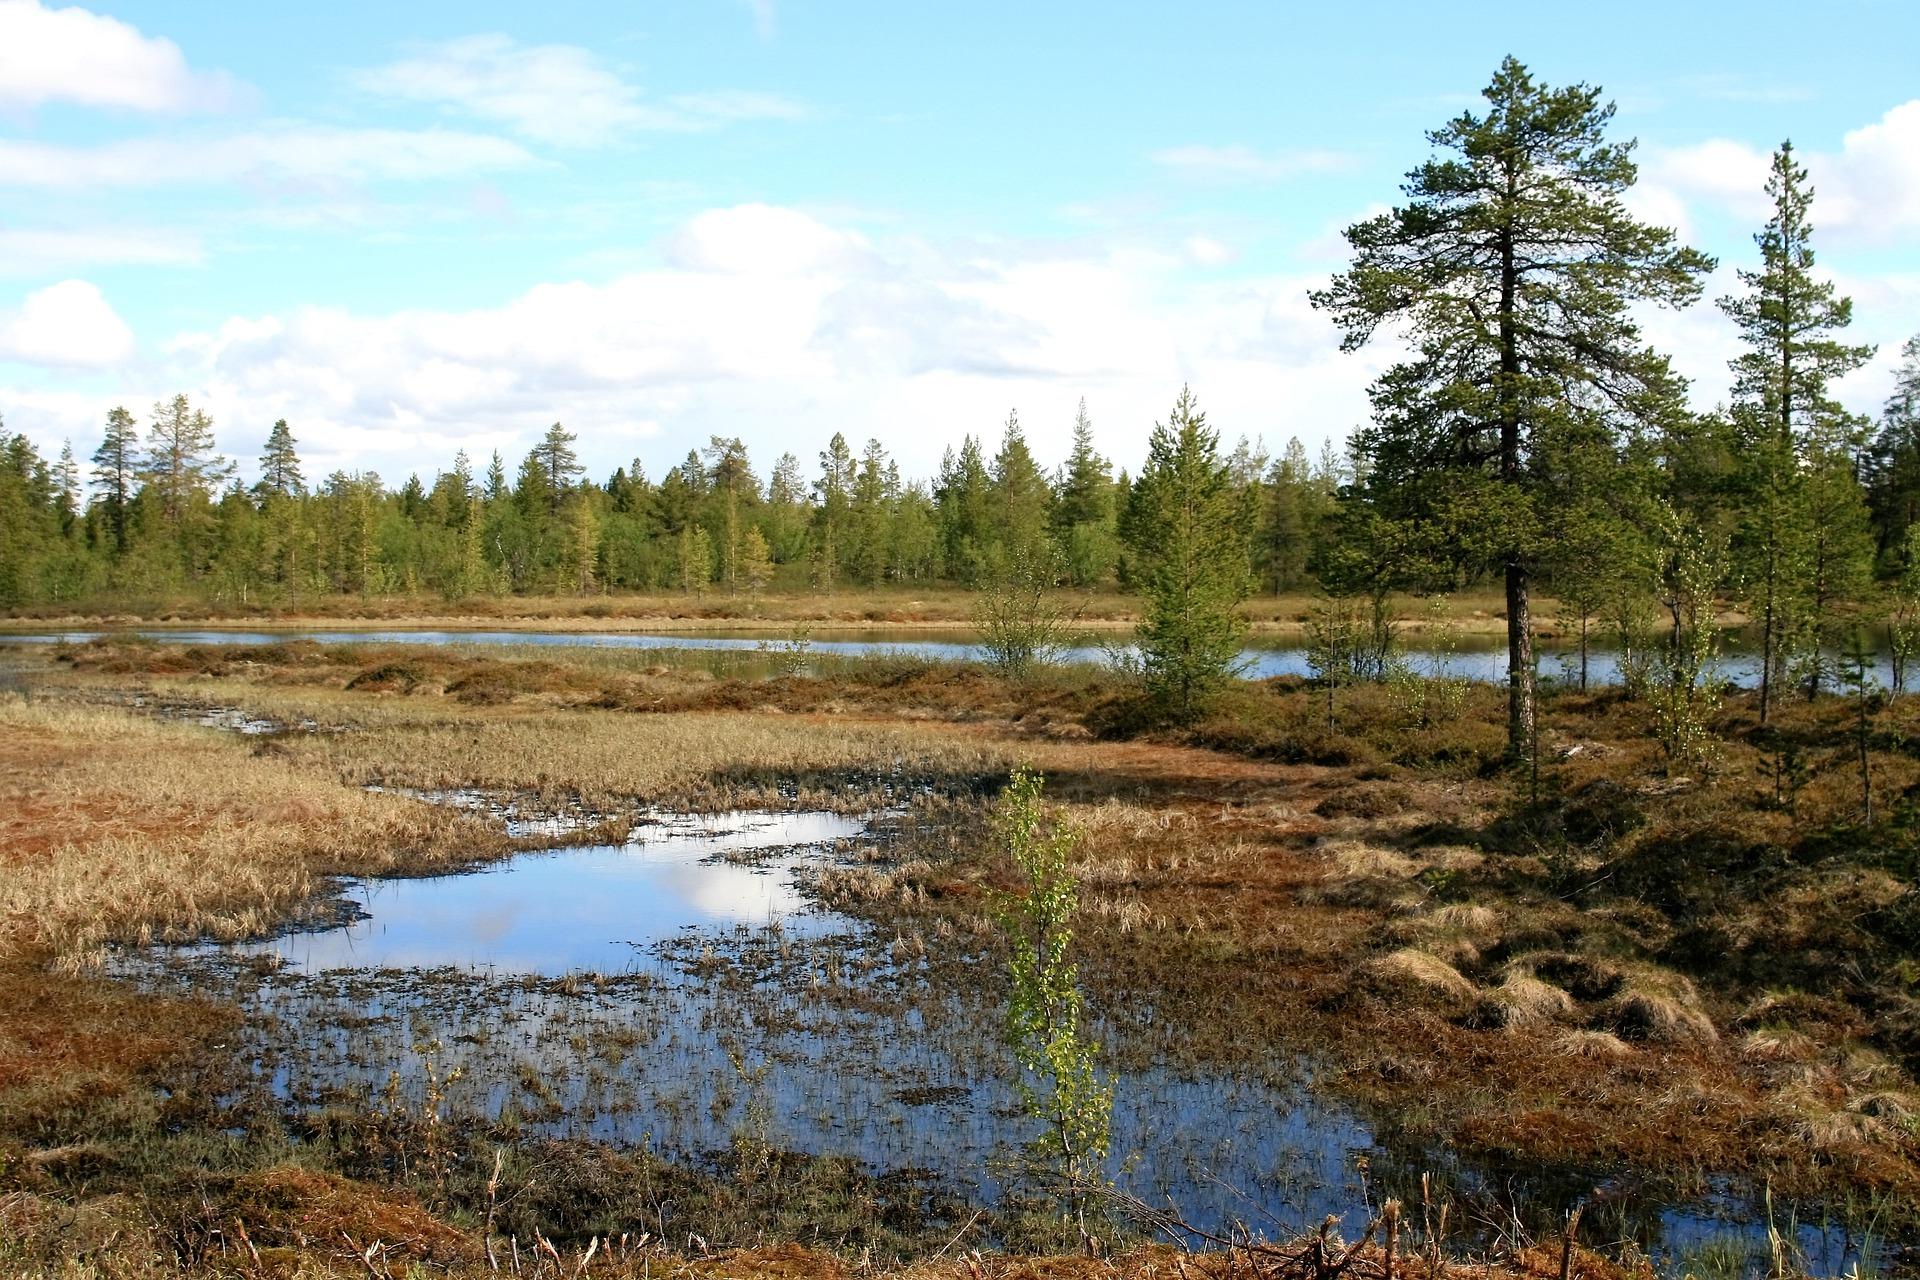 pantano donde proliferan mosquitos